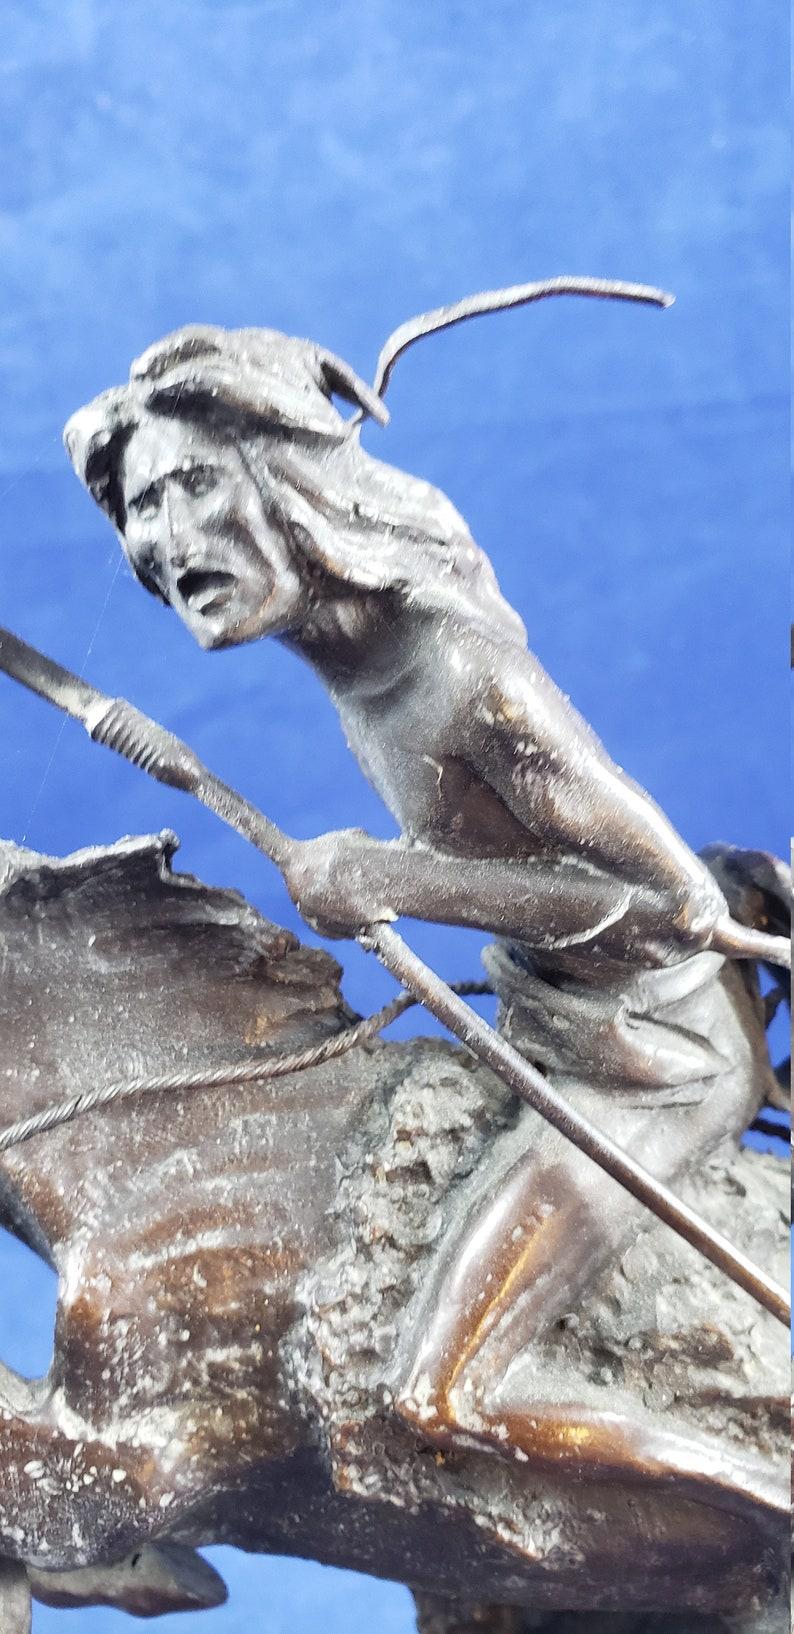 Remington Cheyenne Statue Marble Base 9.5 inch